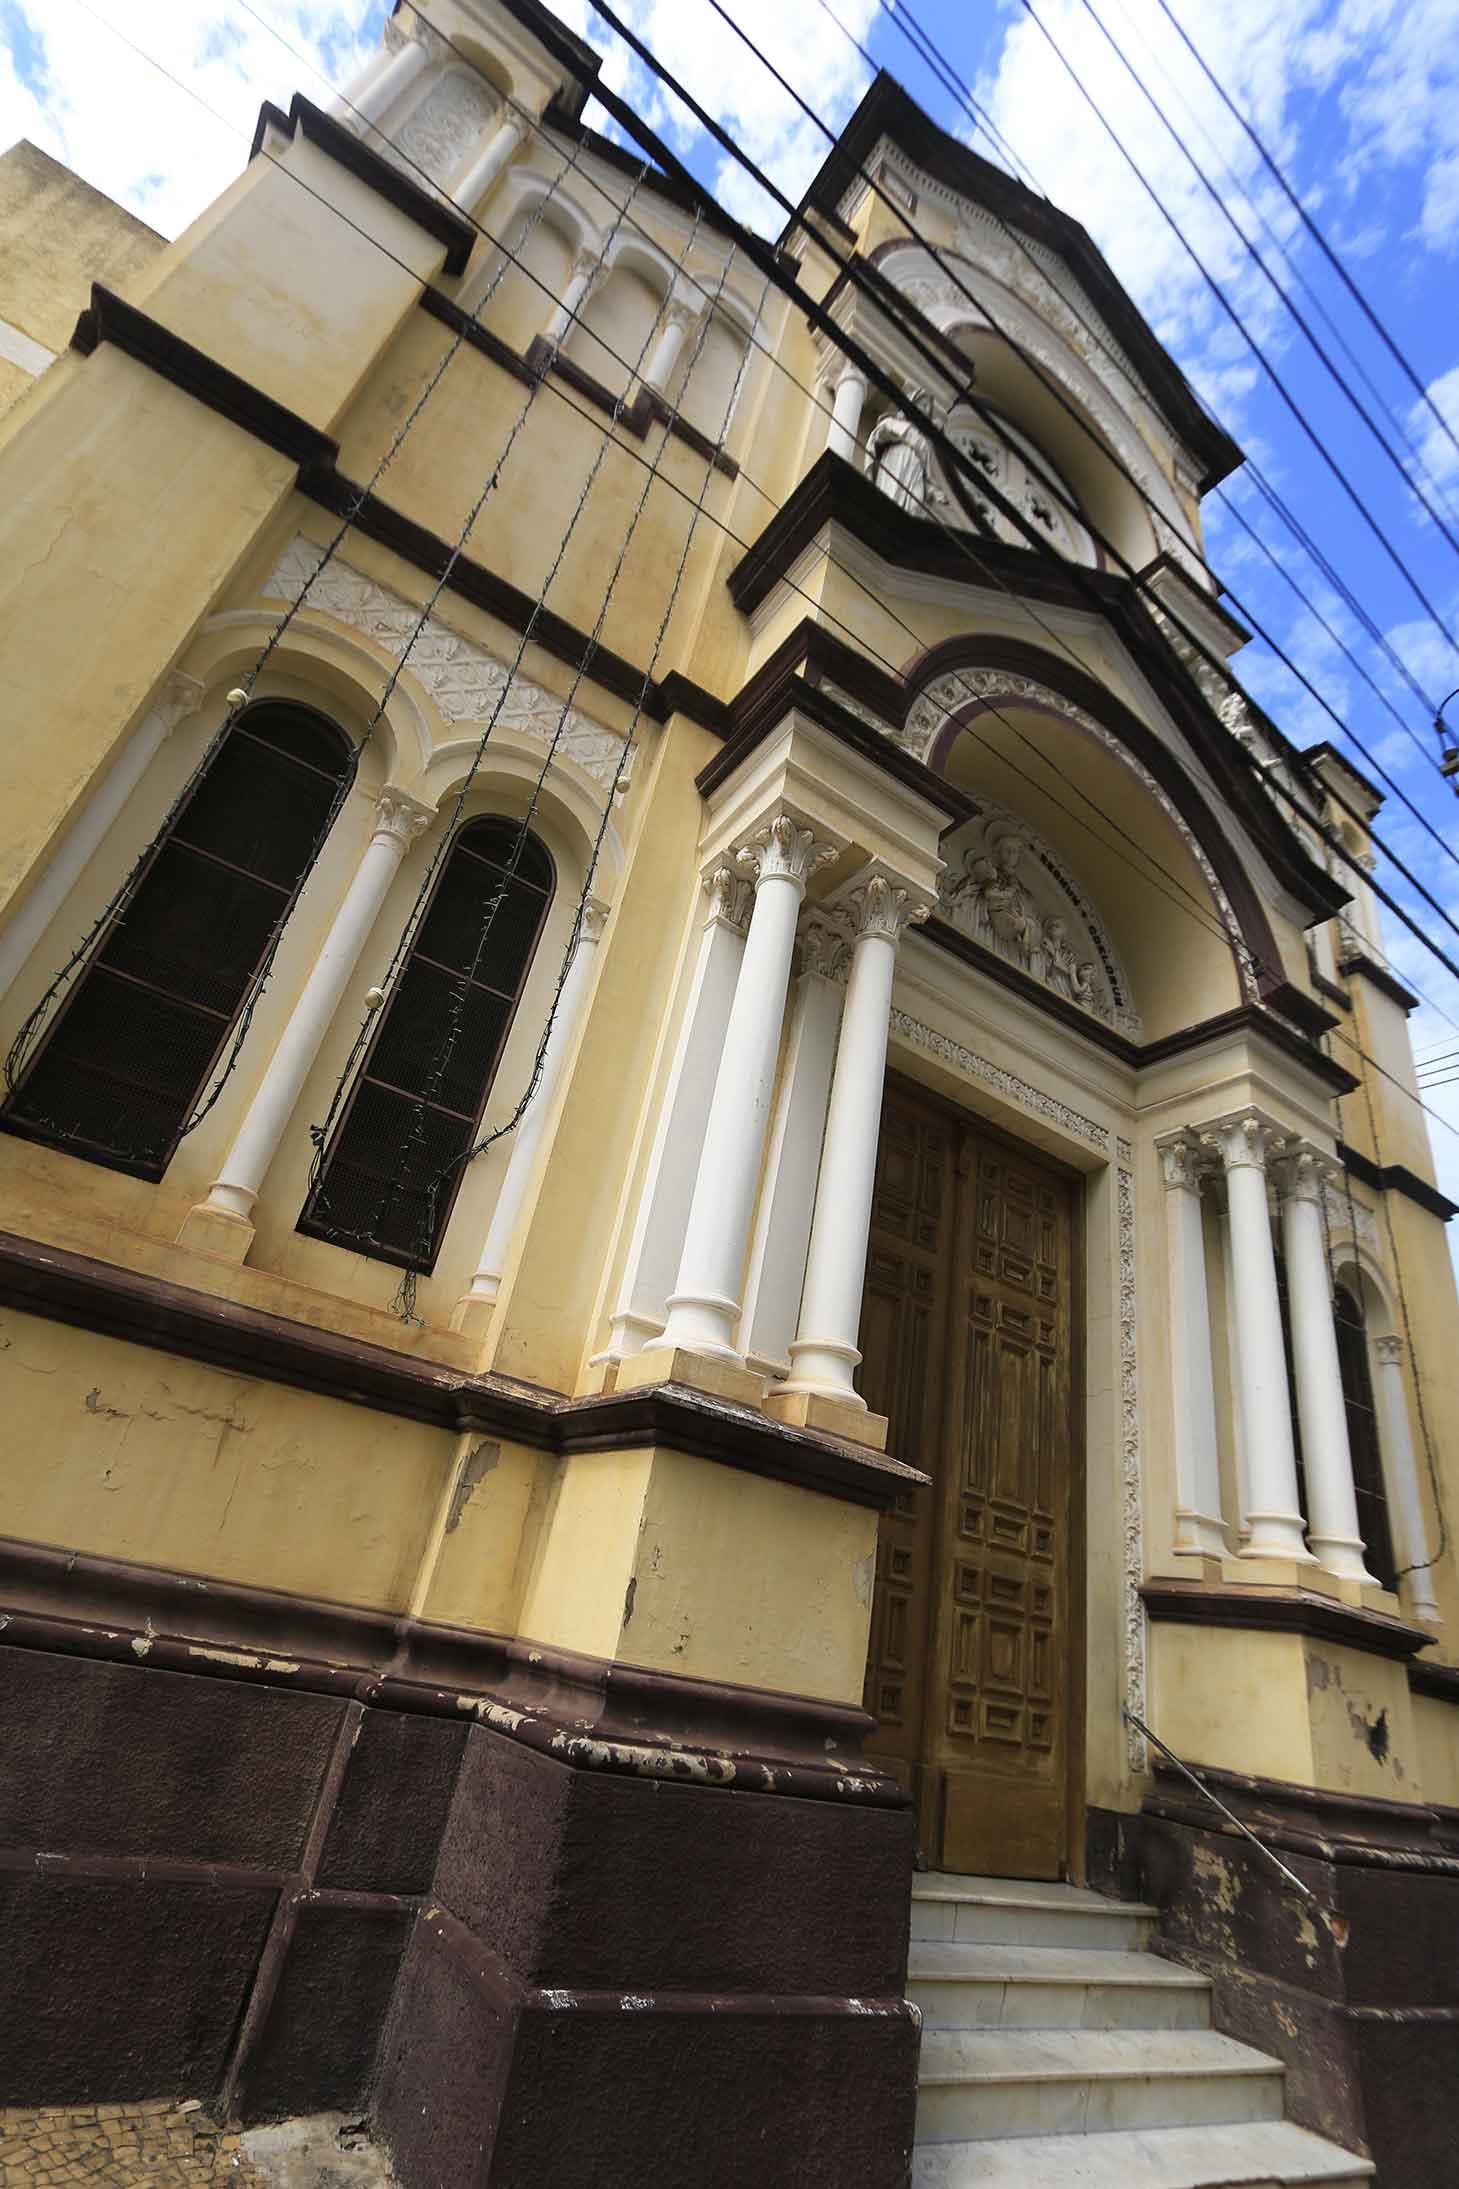 Igreja São Benedito em Campinas-turismo-religioso-igreja-sao-benedito-bx